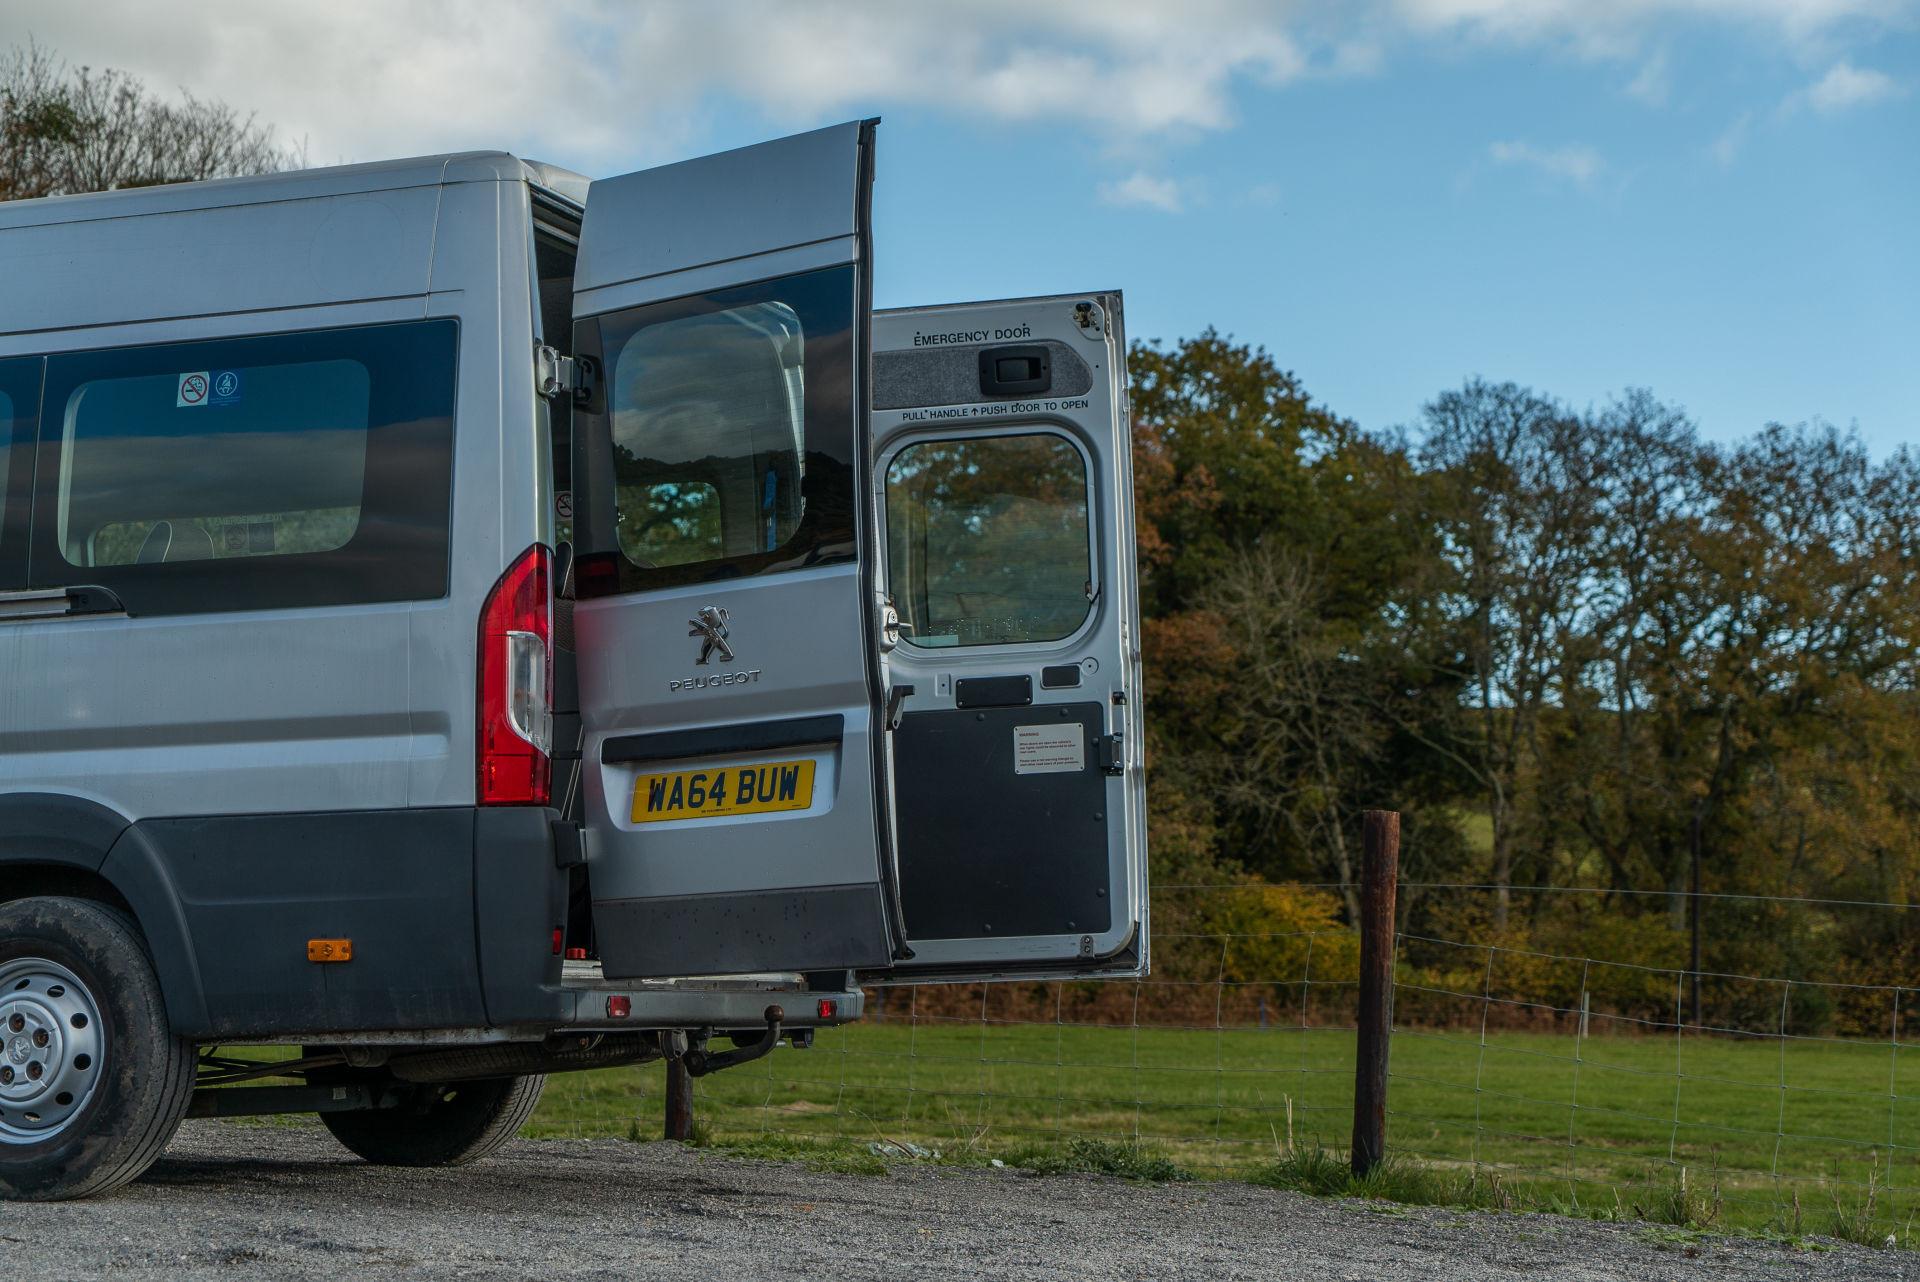 2015 Peugeot Boxer 17 Seater Accessible Minibus for Sale - Image 5